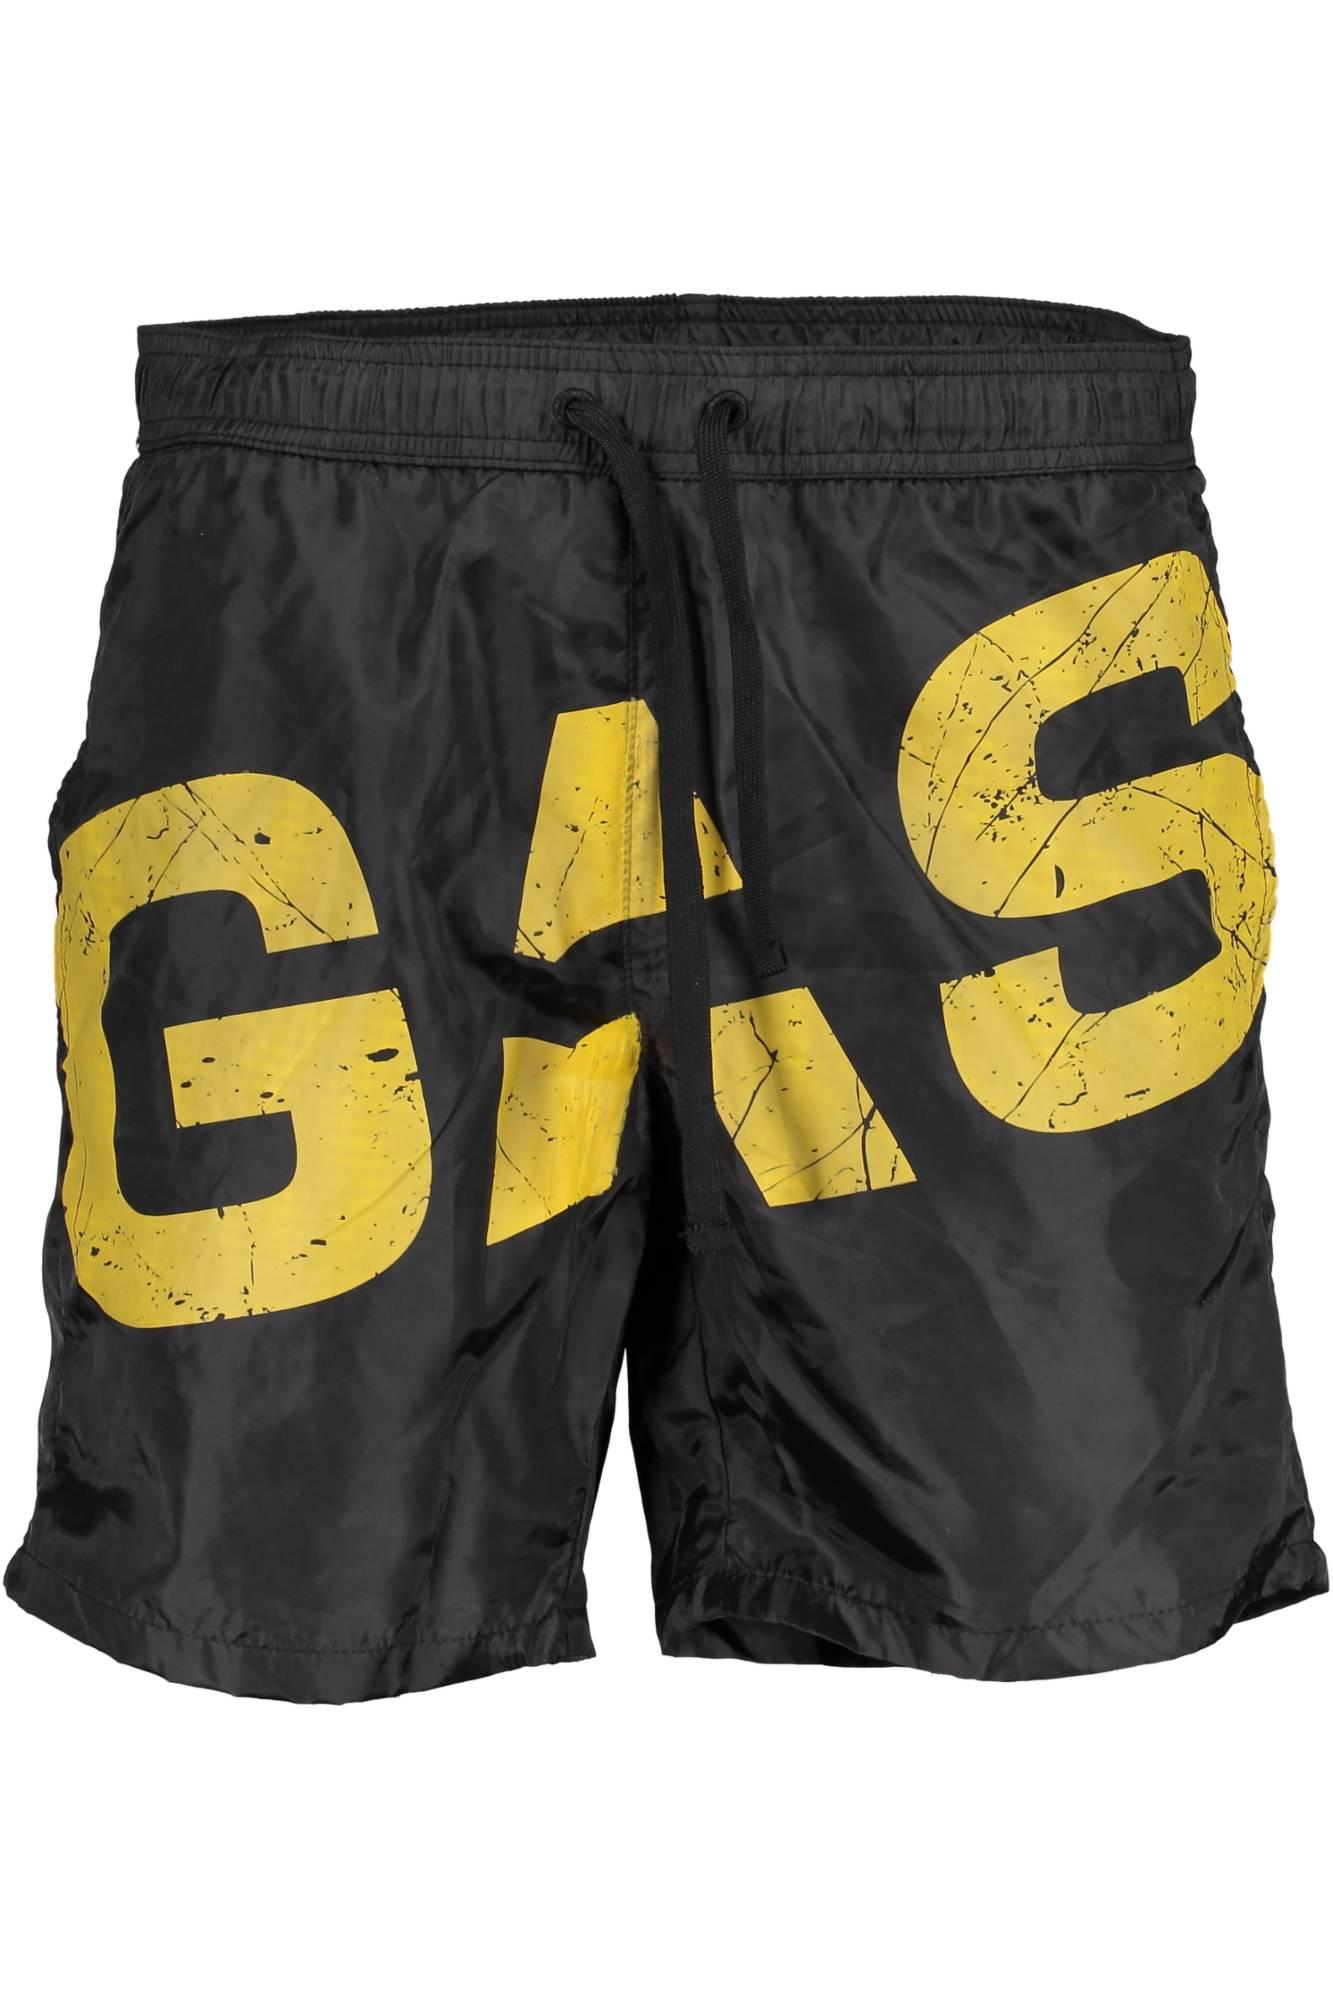 8a658222cf1d Лот 494. Мужские шорты для моря. — ООО